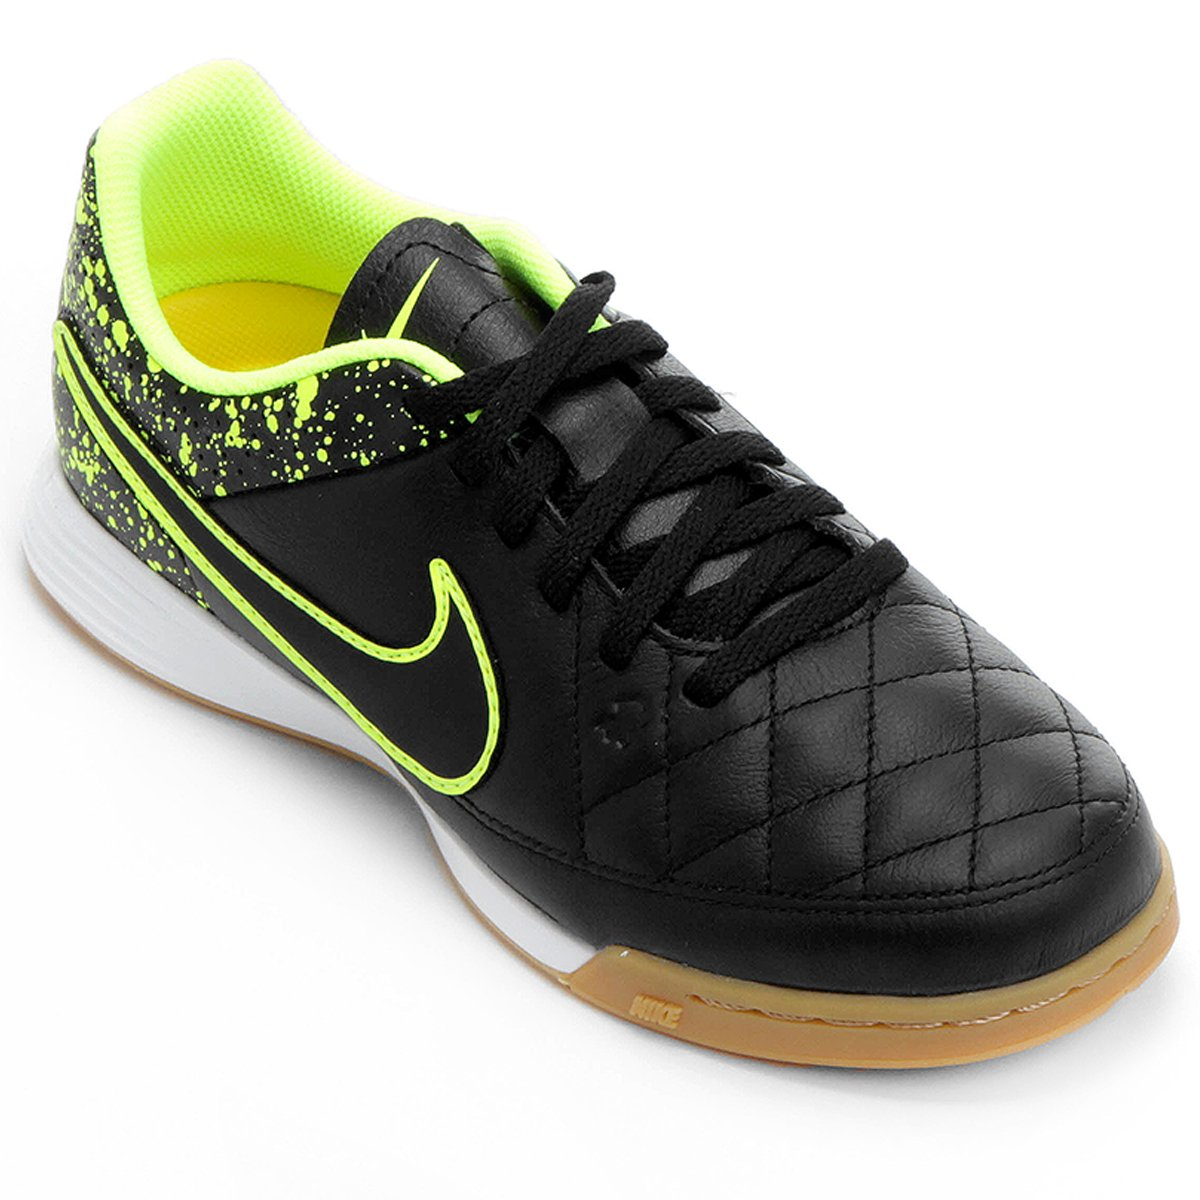 7da2e05f52 Chuteira Nike Tiempo Gênio Leather IC Futsal Infantil - Compre Agora ...